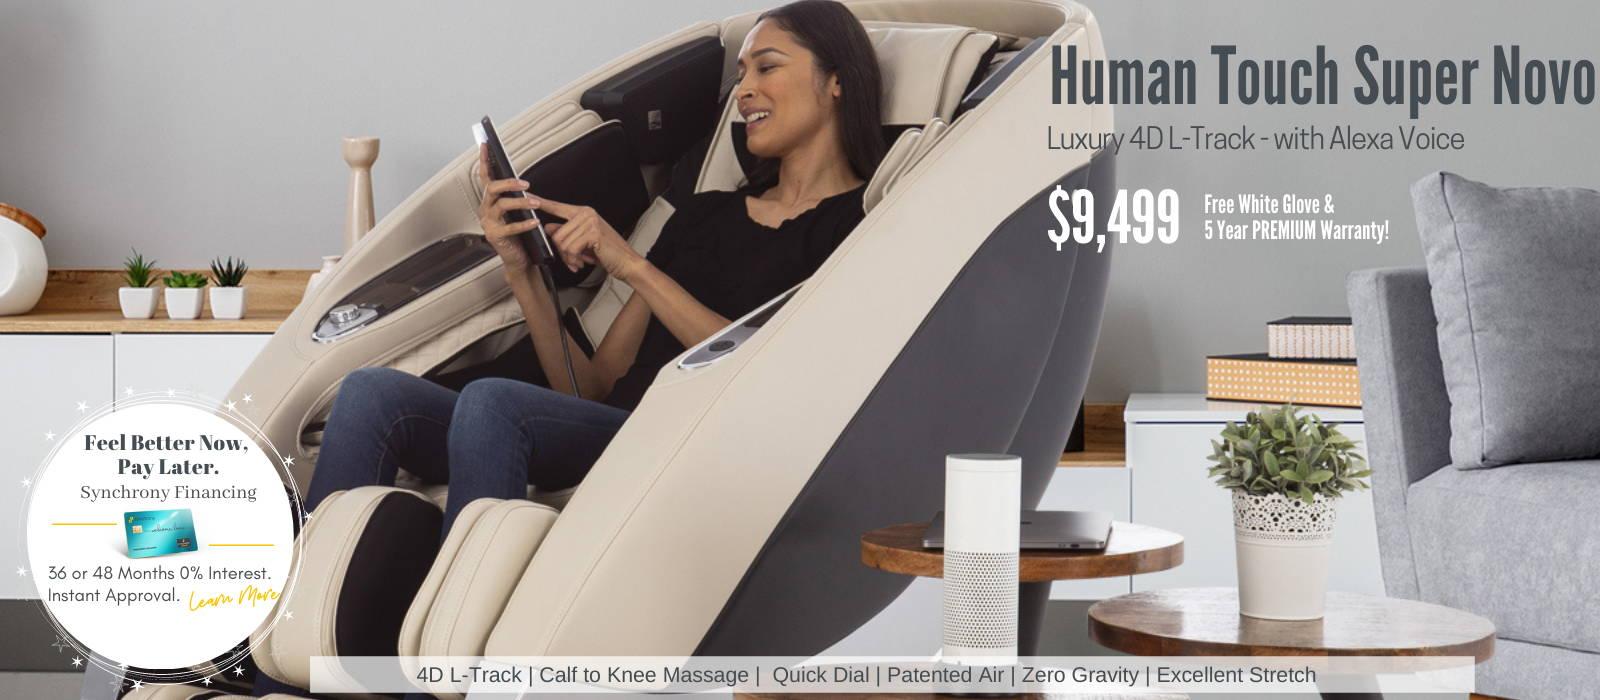 Human Touch Super Novo 4D L-Track Massage Chair 2020